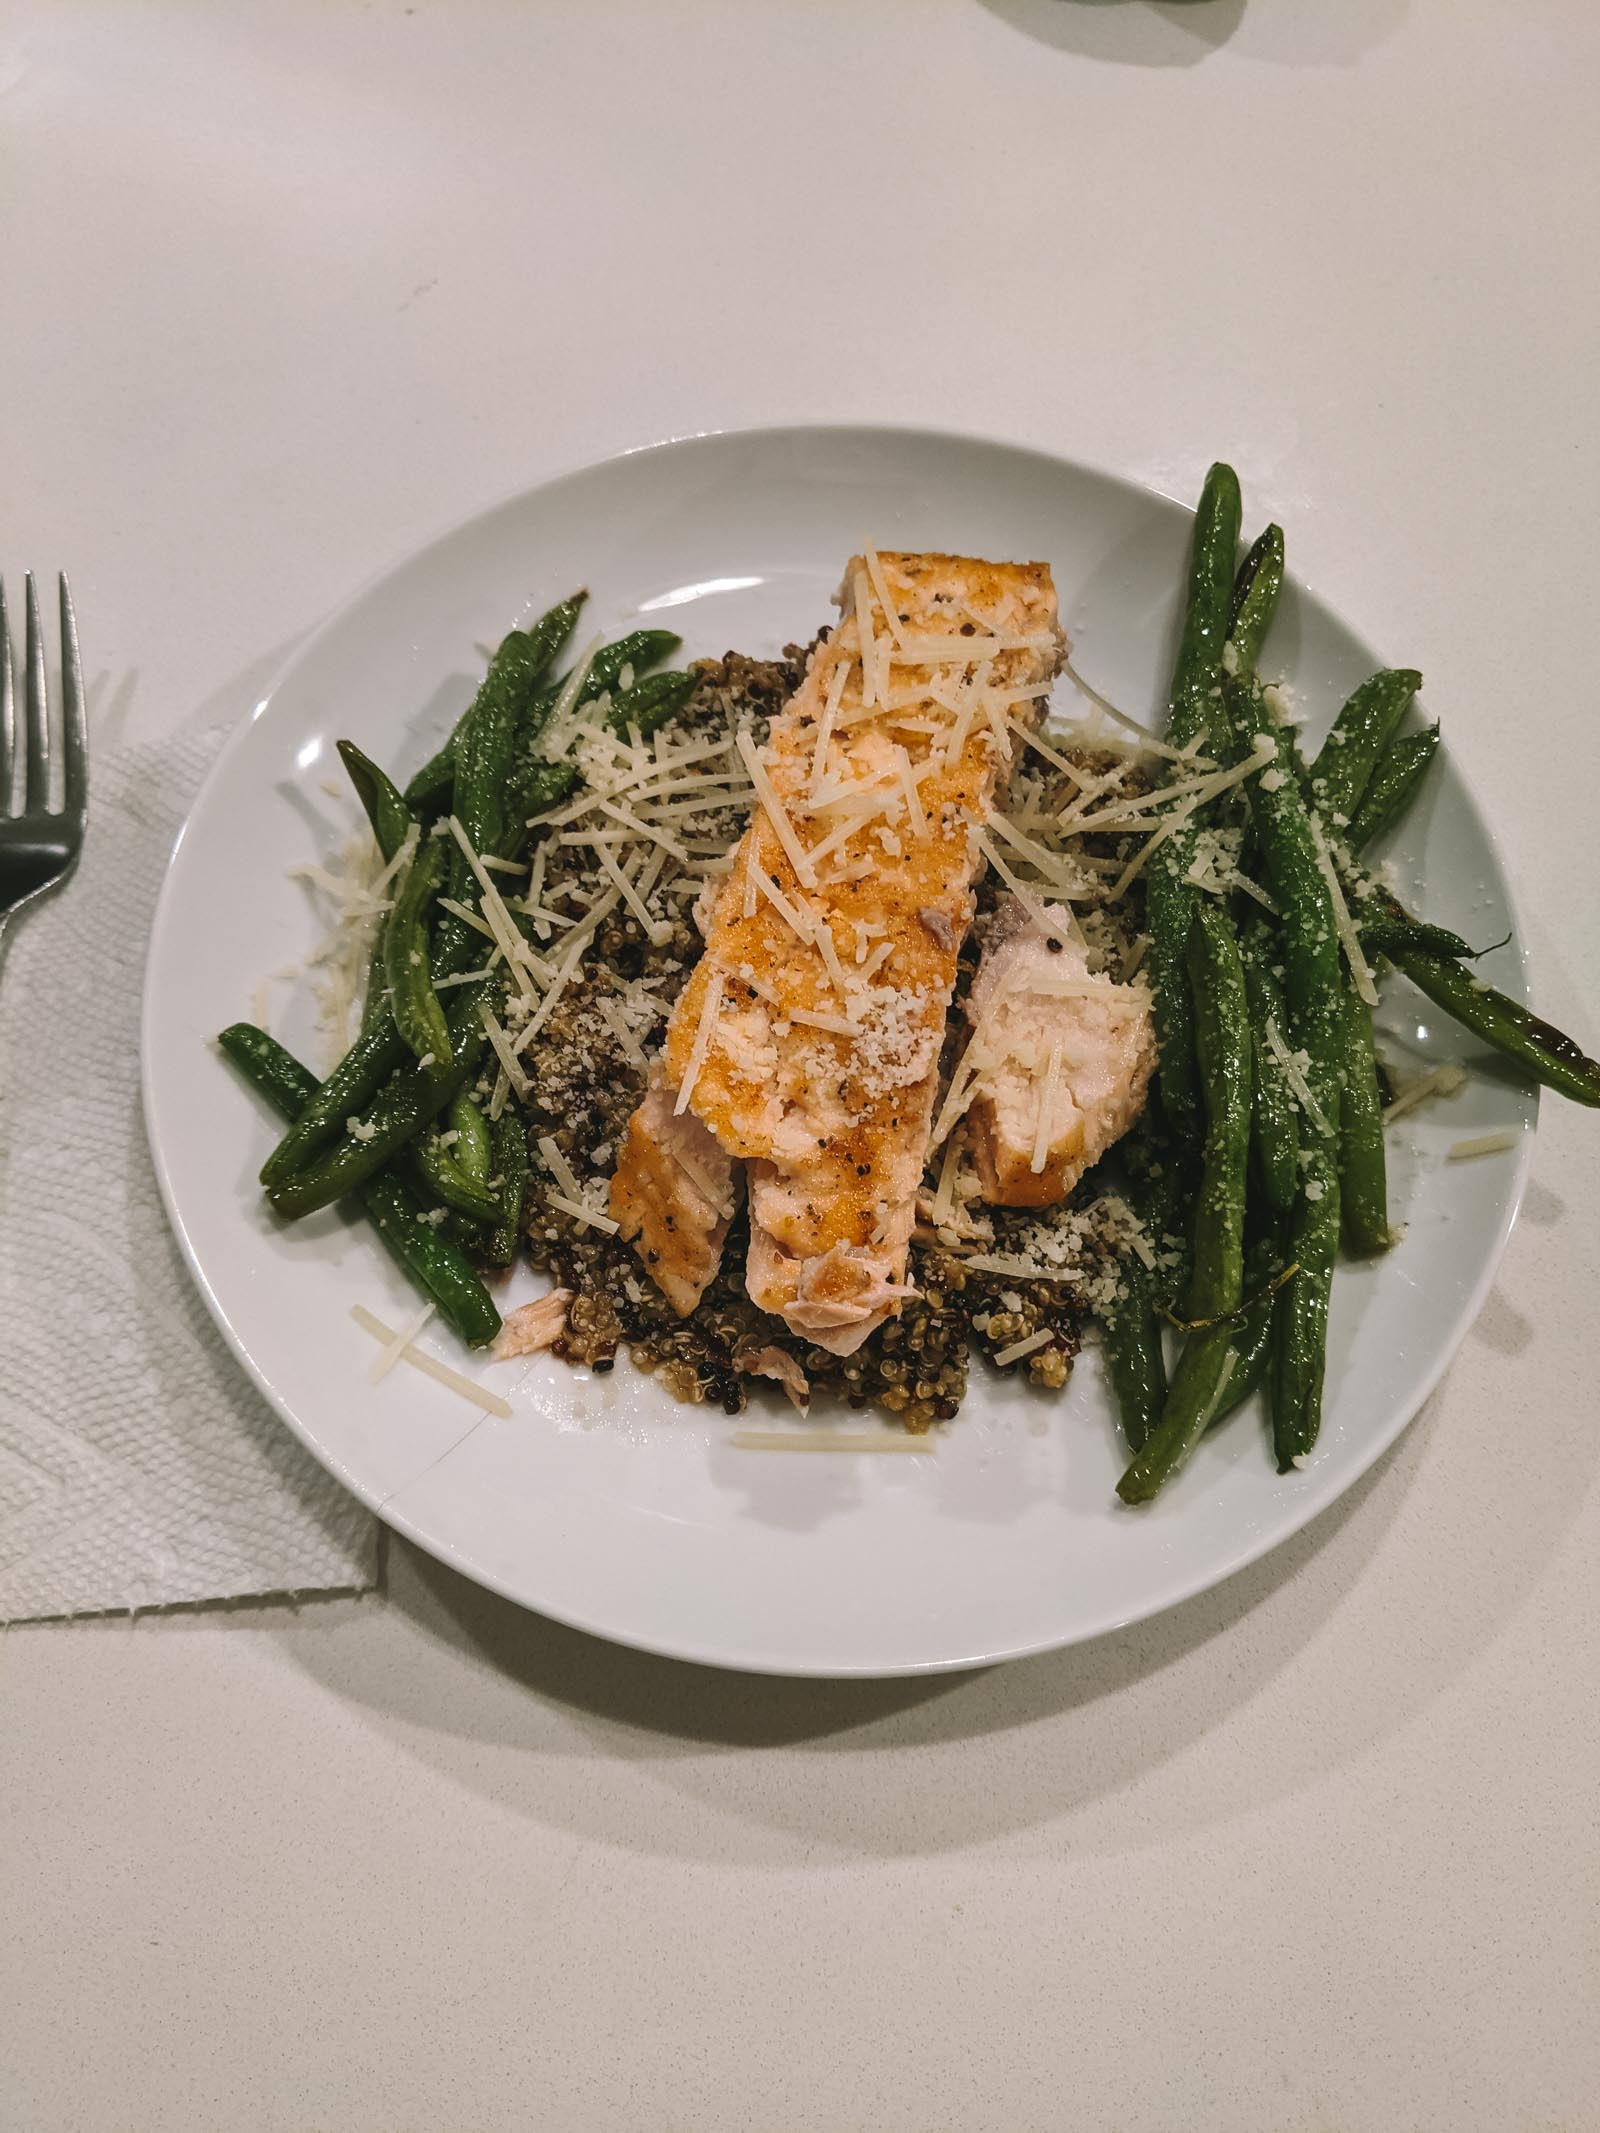 Salmon + rice + green beans + cheese